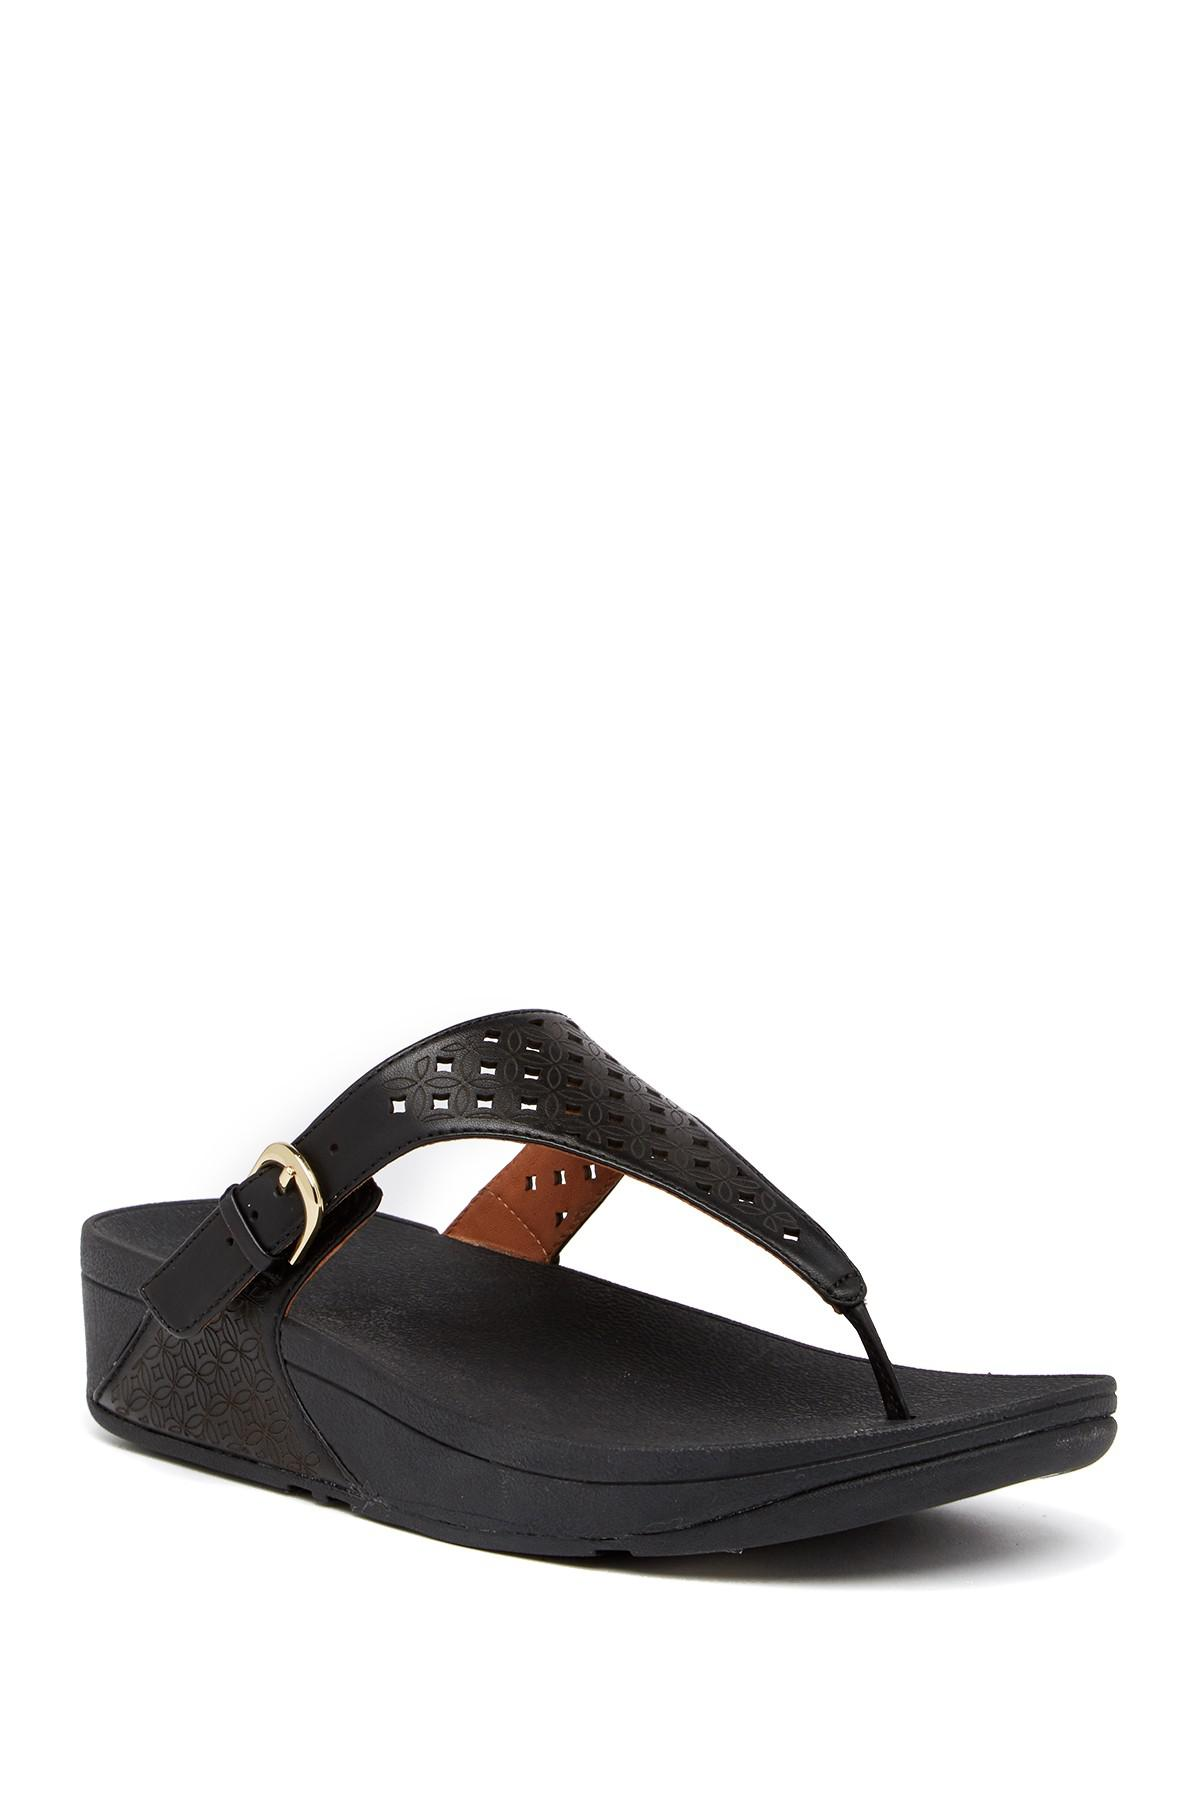 Fitflop. Women's Black Skinny Toe Post Lattice Wedge Sandal